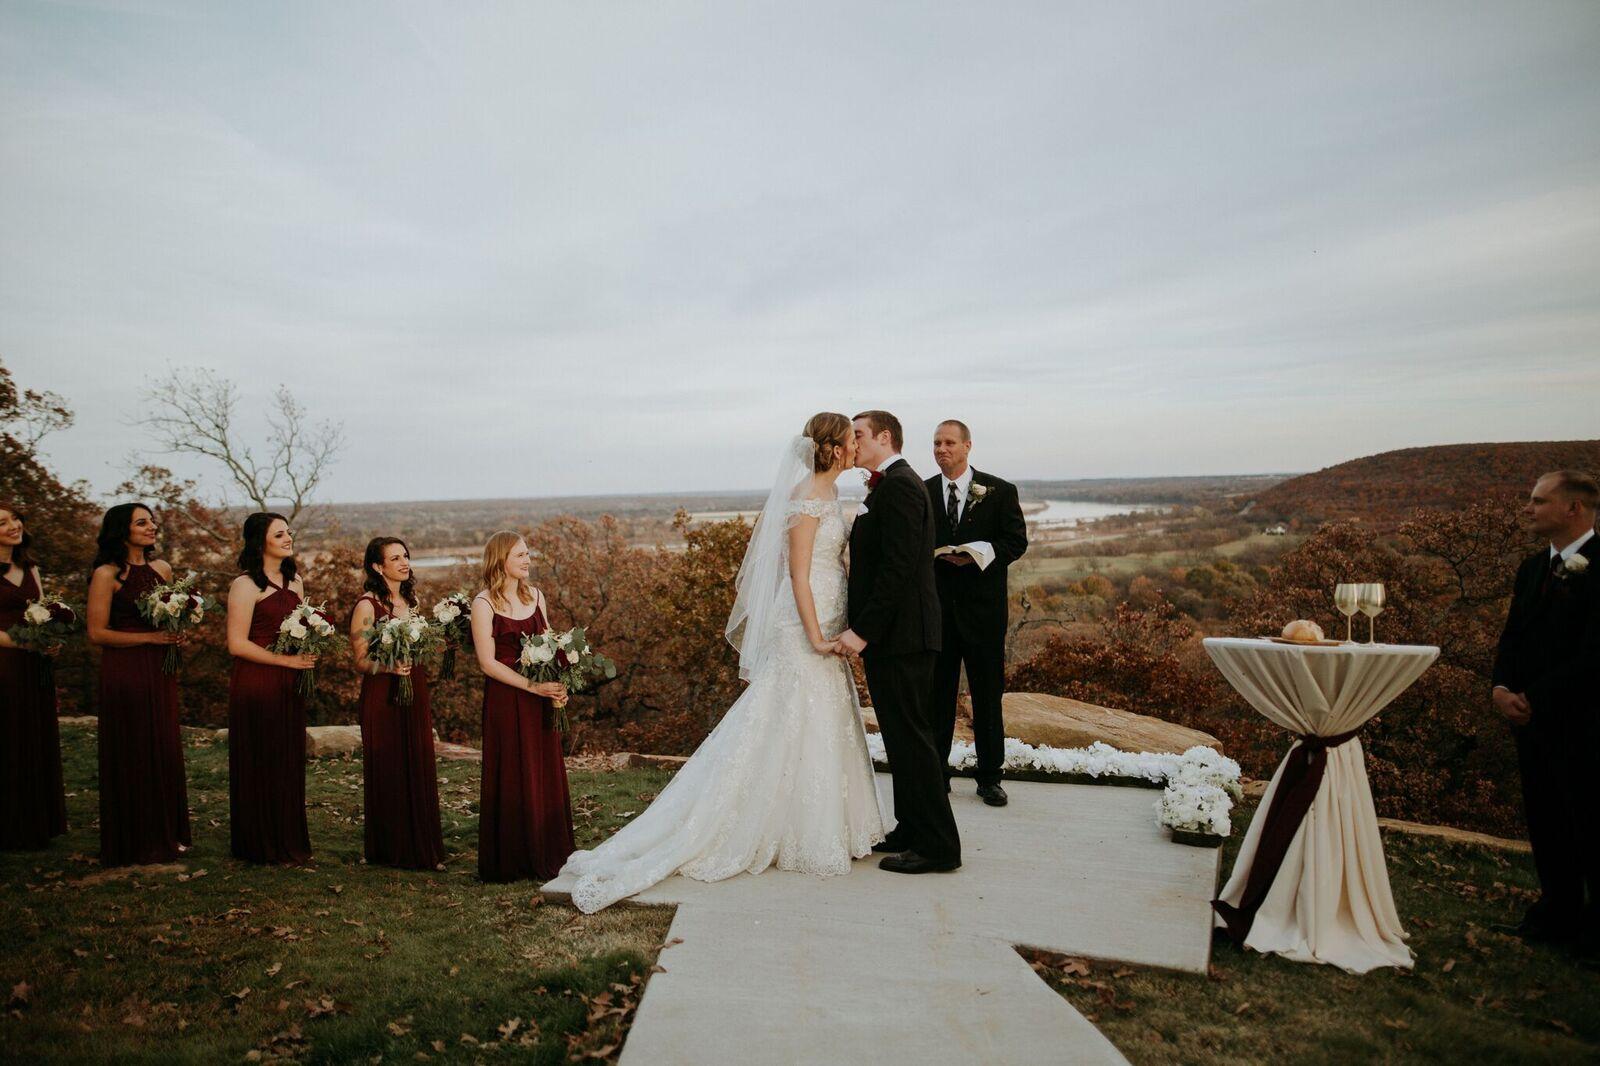 Tulsa Wedding Venue White Barn 18a.jpg